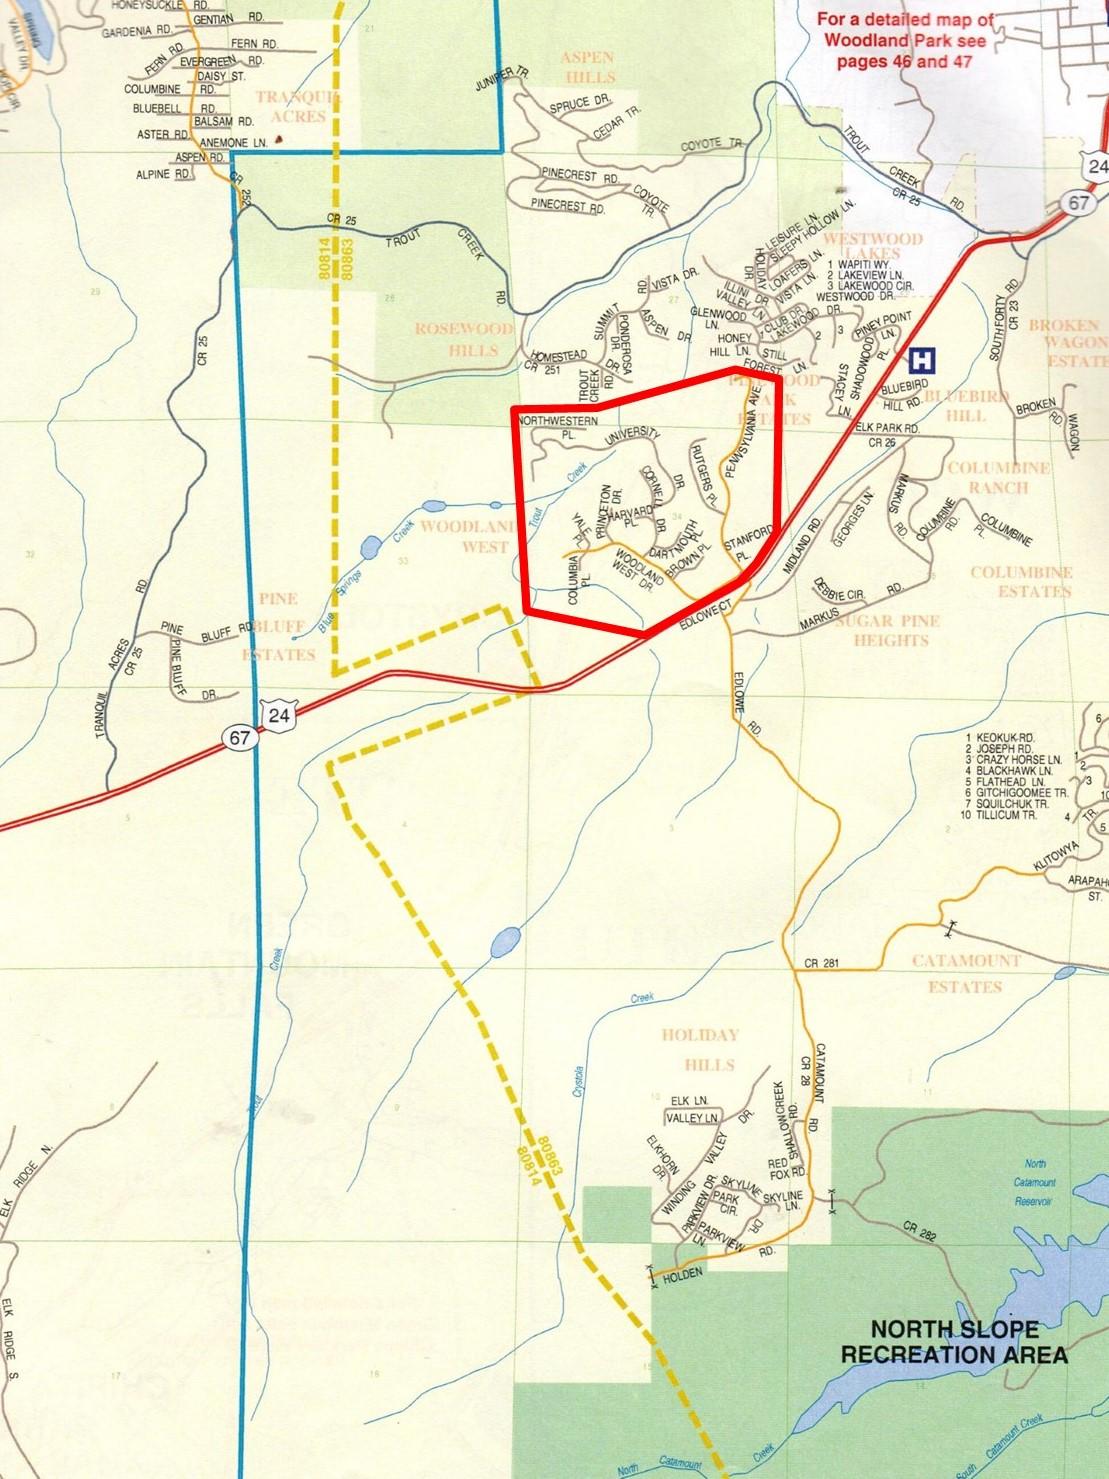 Woodland West Map